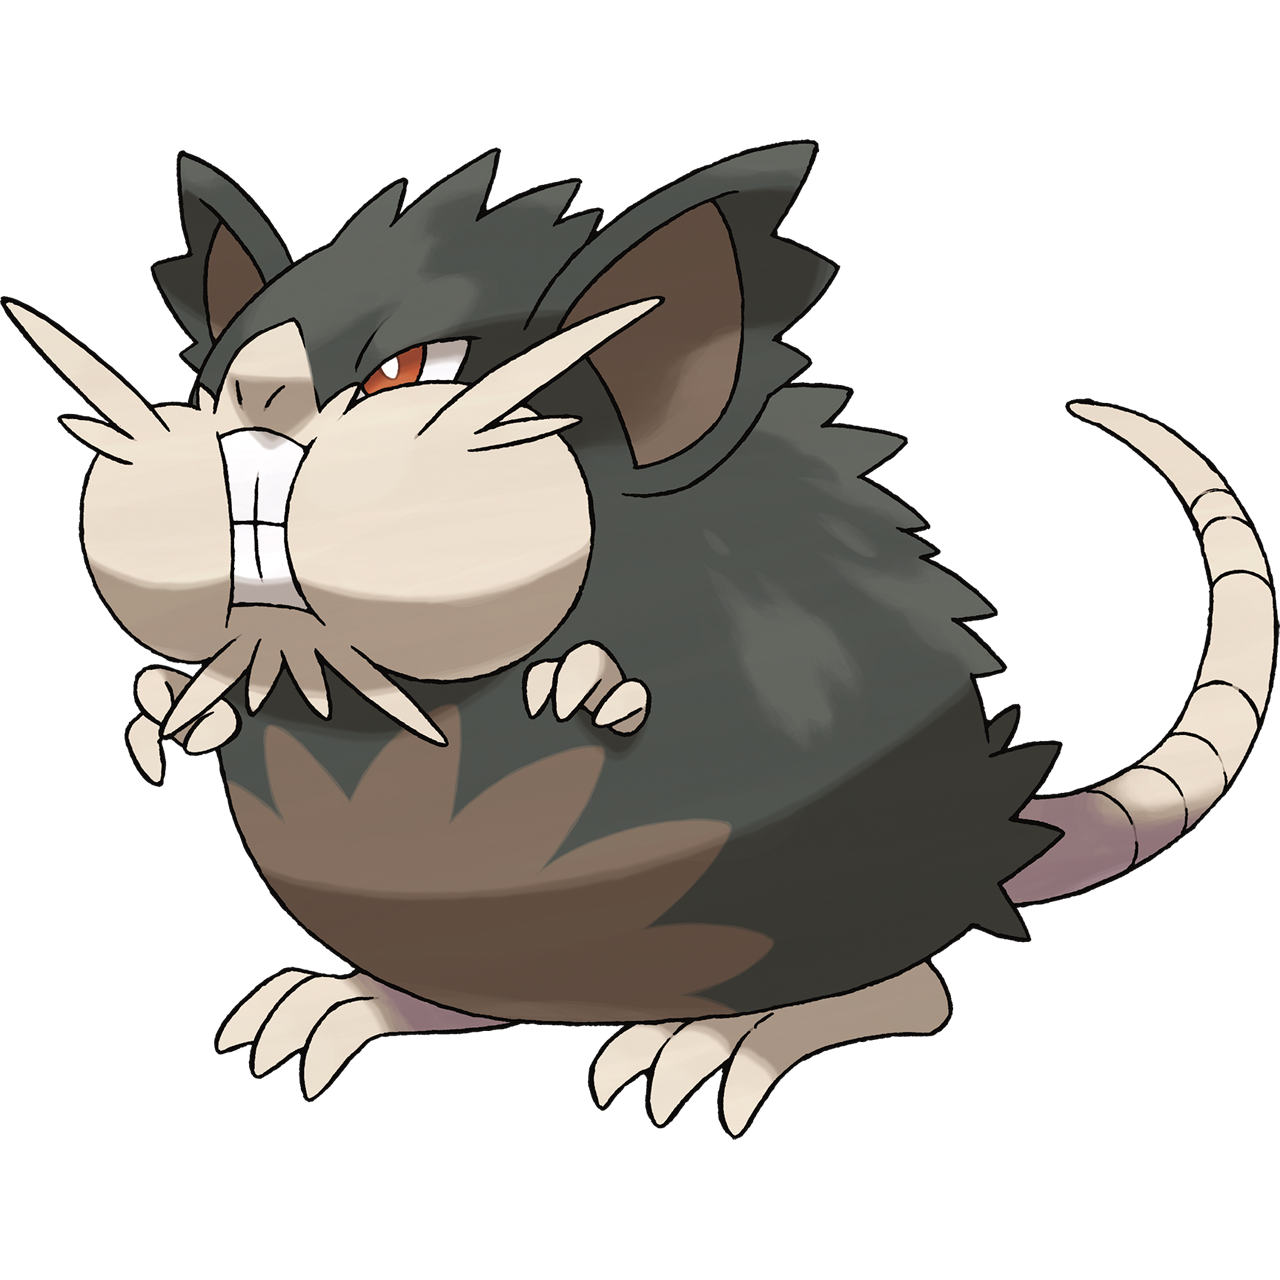 Pok mon alolan forms. Clipart mouse noisy